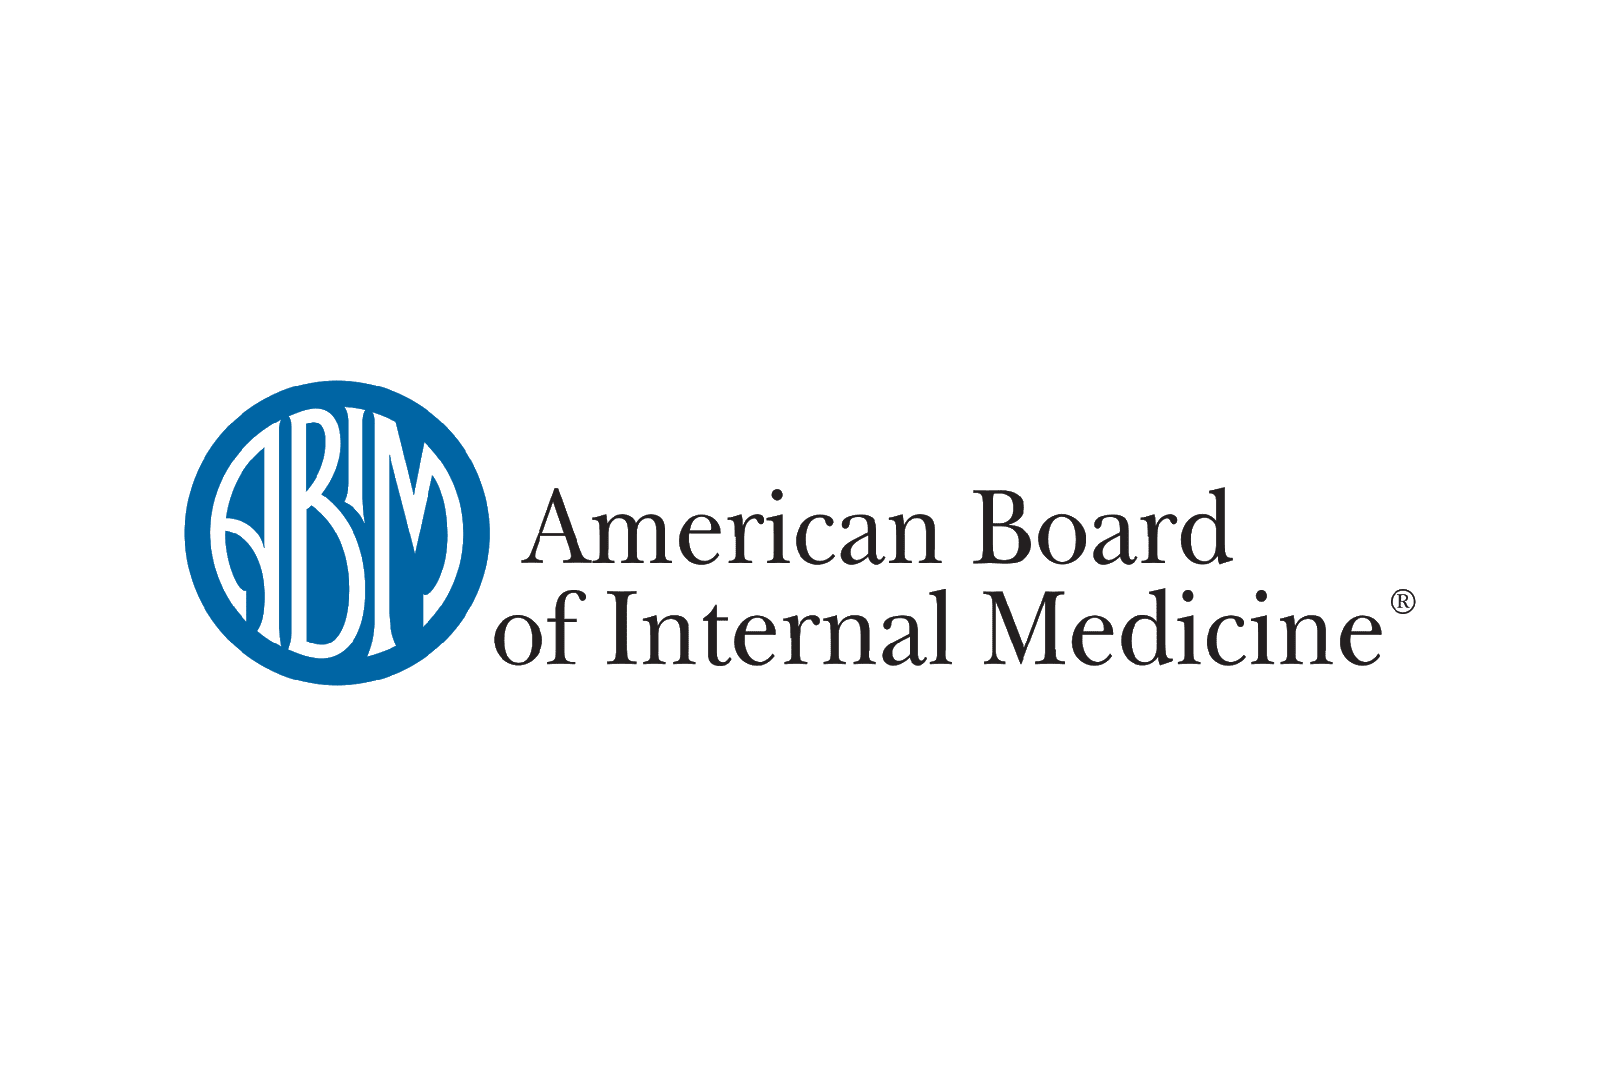 American Board of Internal Medicine ®